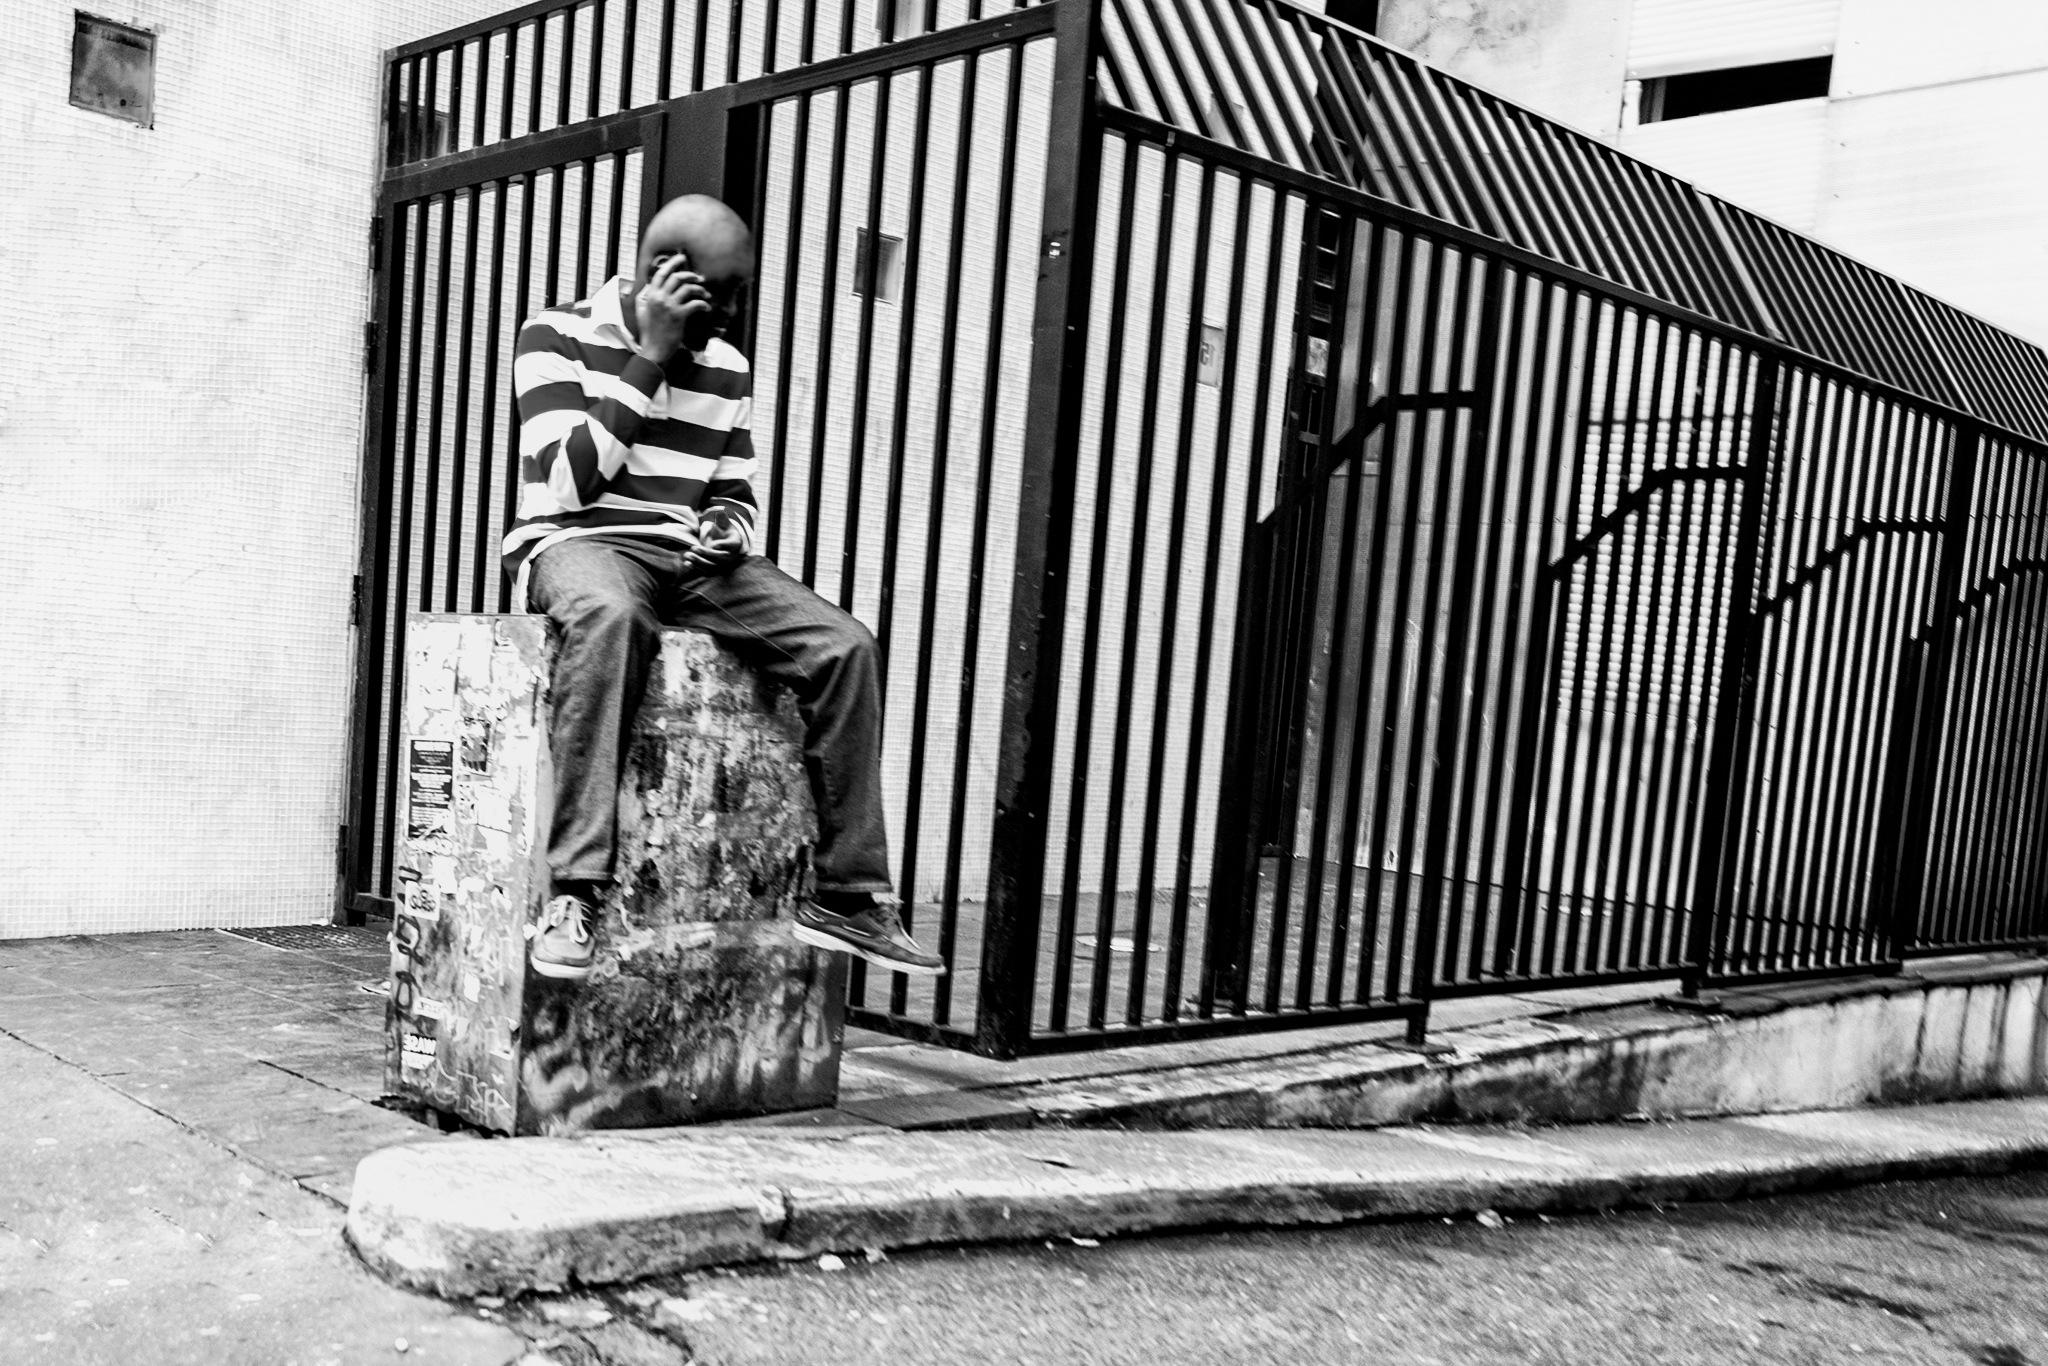 Street by Cristina MSoler